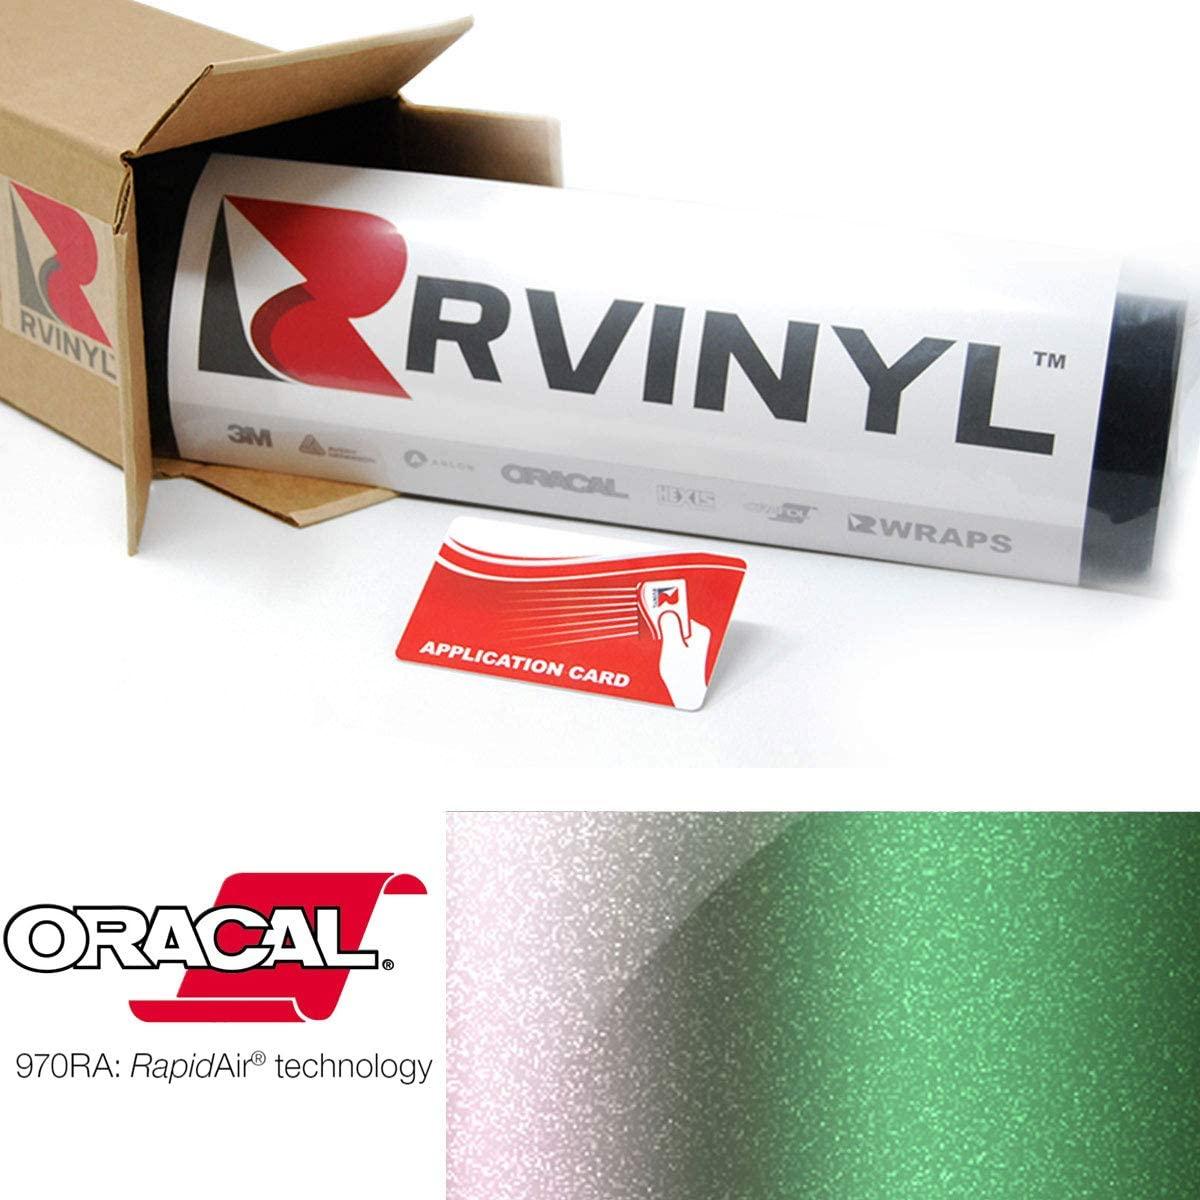 ORACAL 970RA Shift Effect Gloss Avocado 317 Wrapping Cast Film Vehicle Car Wrap Vinyl Sheet Roll - (1ft x 5ft w/App Card)